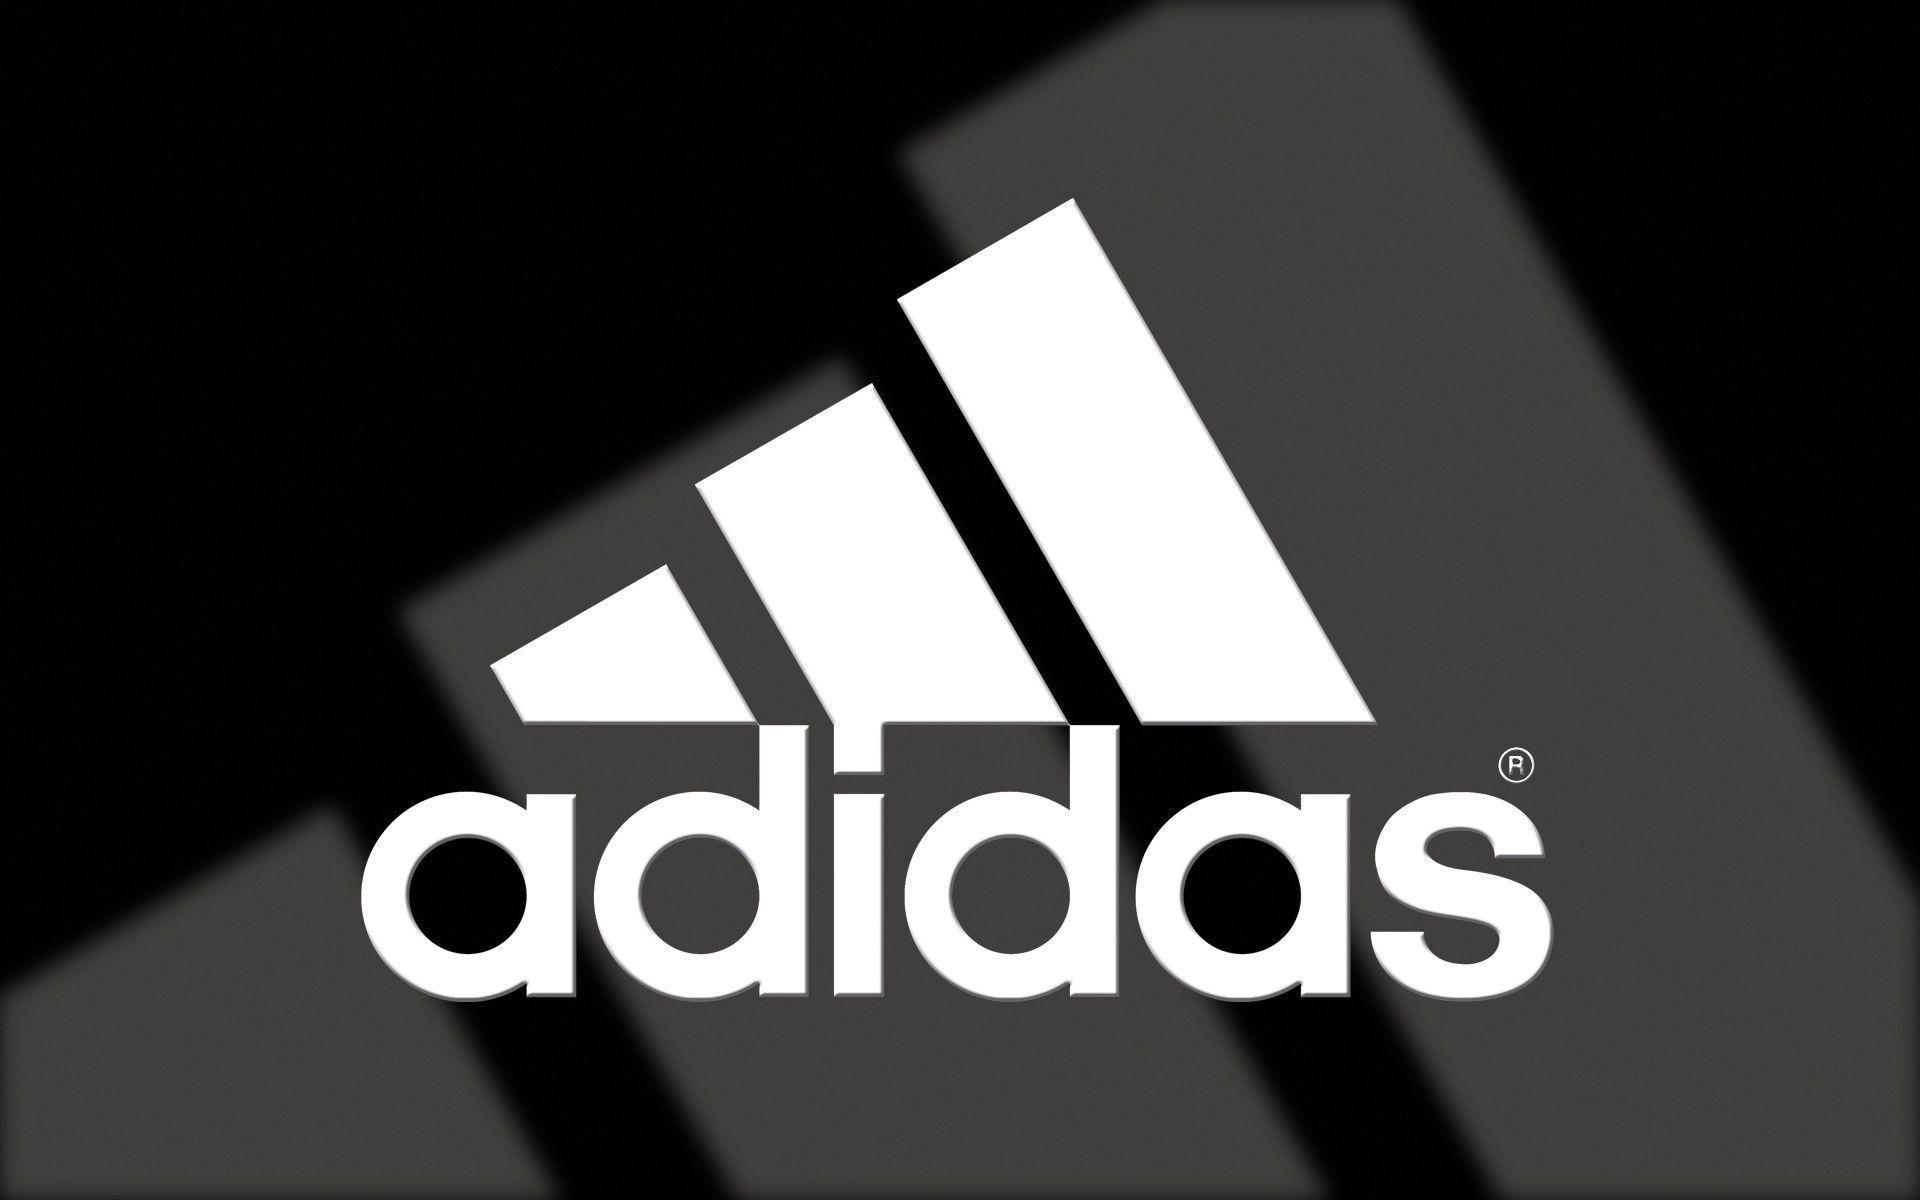 zapatos adidas wallpaper download